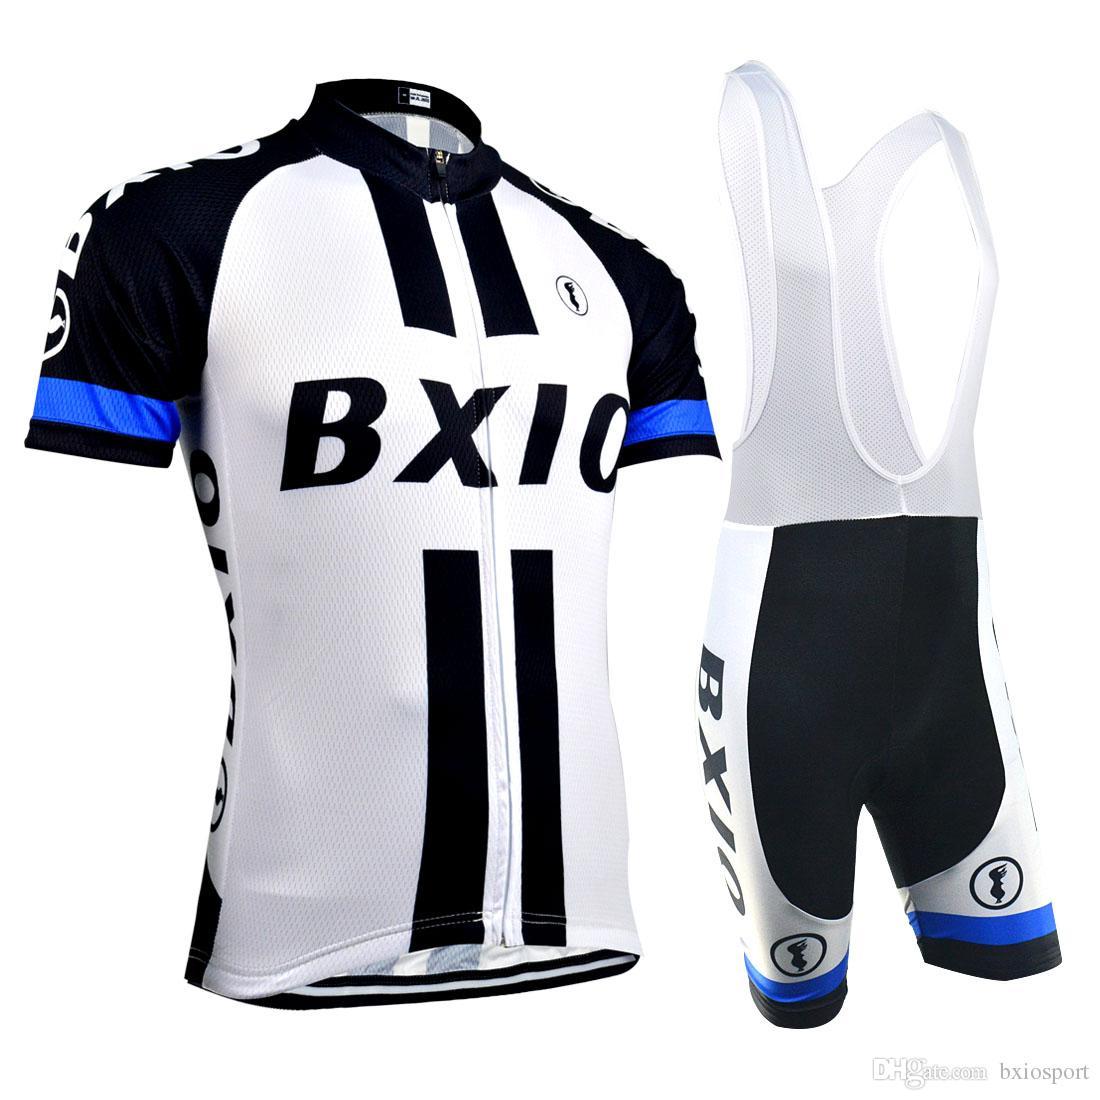 5180f1310 BXIO Brand Men Cycling Clothing Short Sleeve Full Zipper Cycling Jerseys  Summer Short Sleeve Set Cool Bicycle Clothes Quality BX 08 Bike T Shirt  Cycle ...